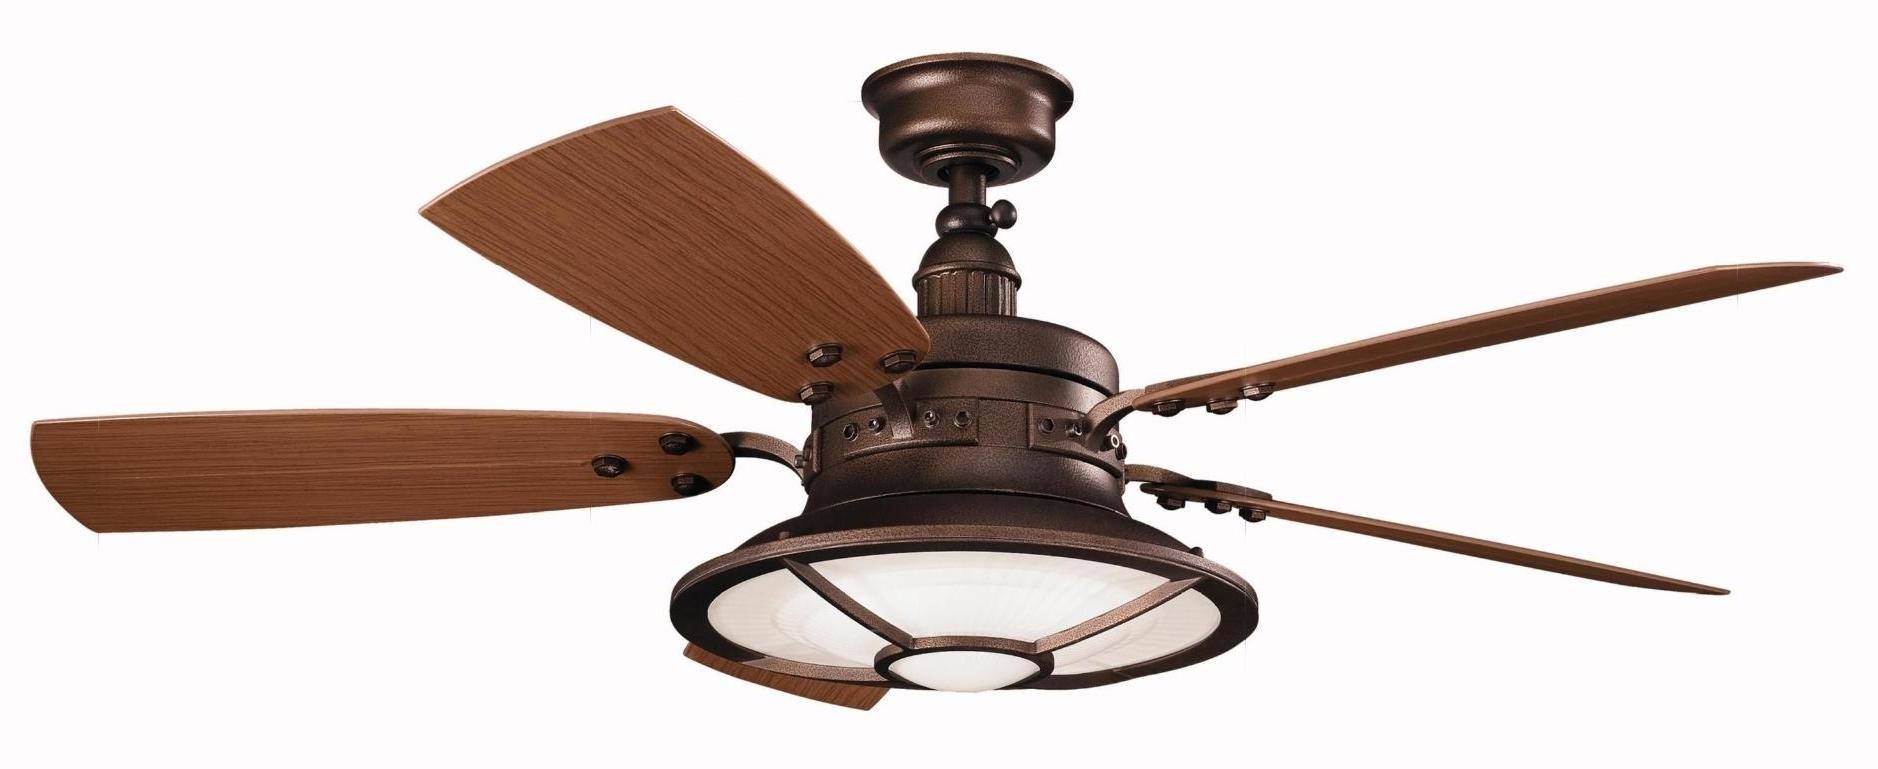 Light : Kichler Fan Led Lighting Ceiling Fans Waterproof Outdoor Within Favorite Waterproof Outdoor Ceiling Fans (View 6 of 20)